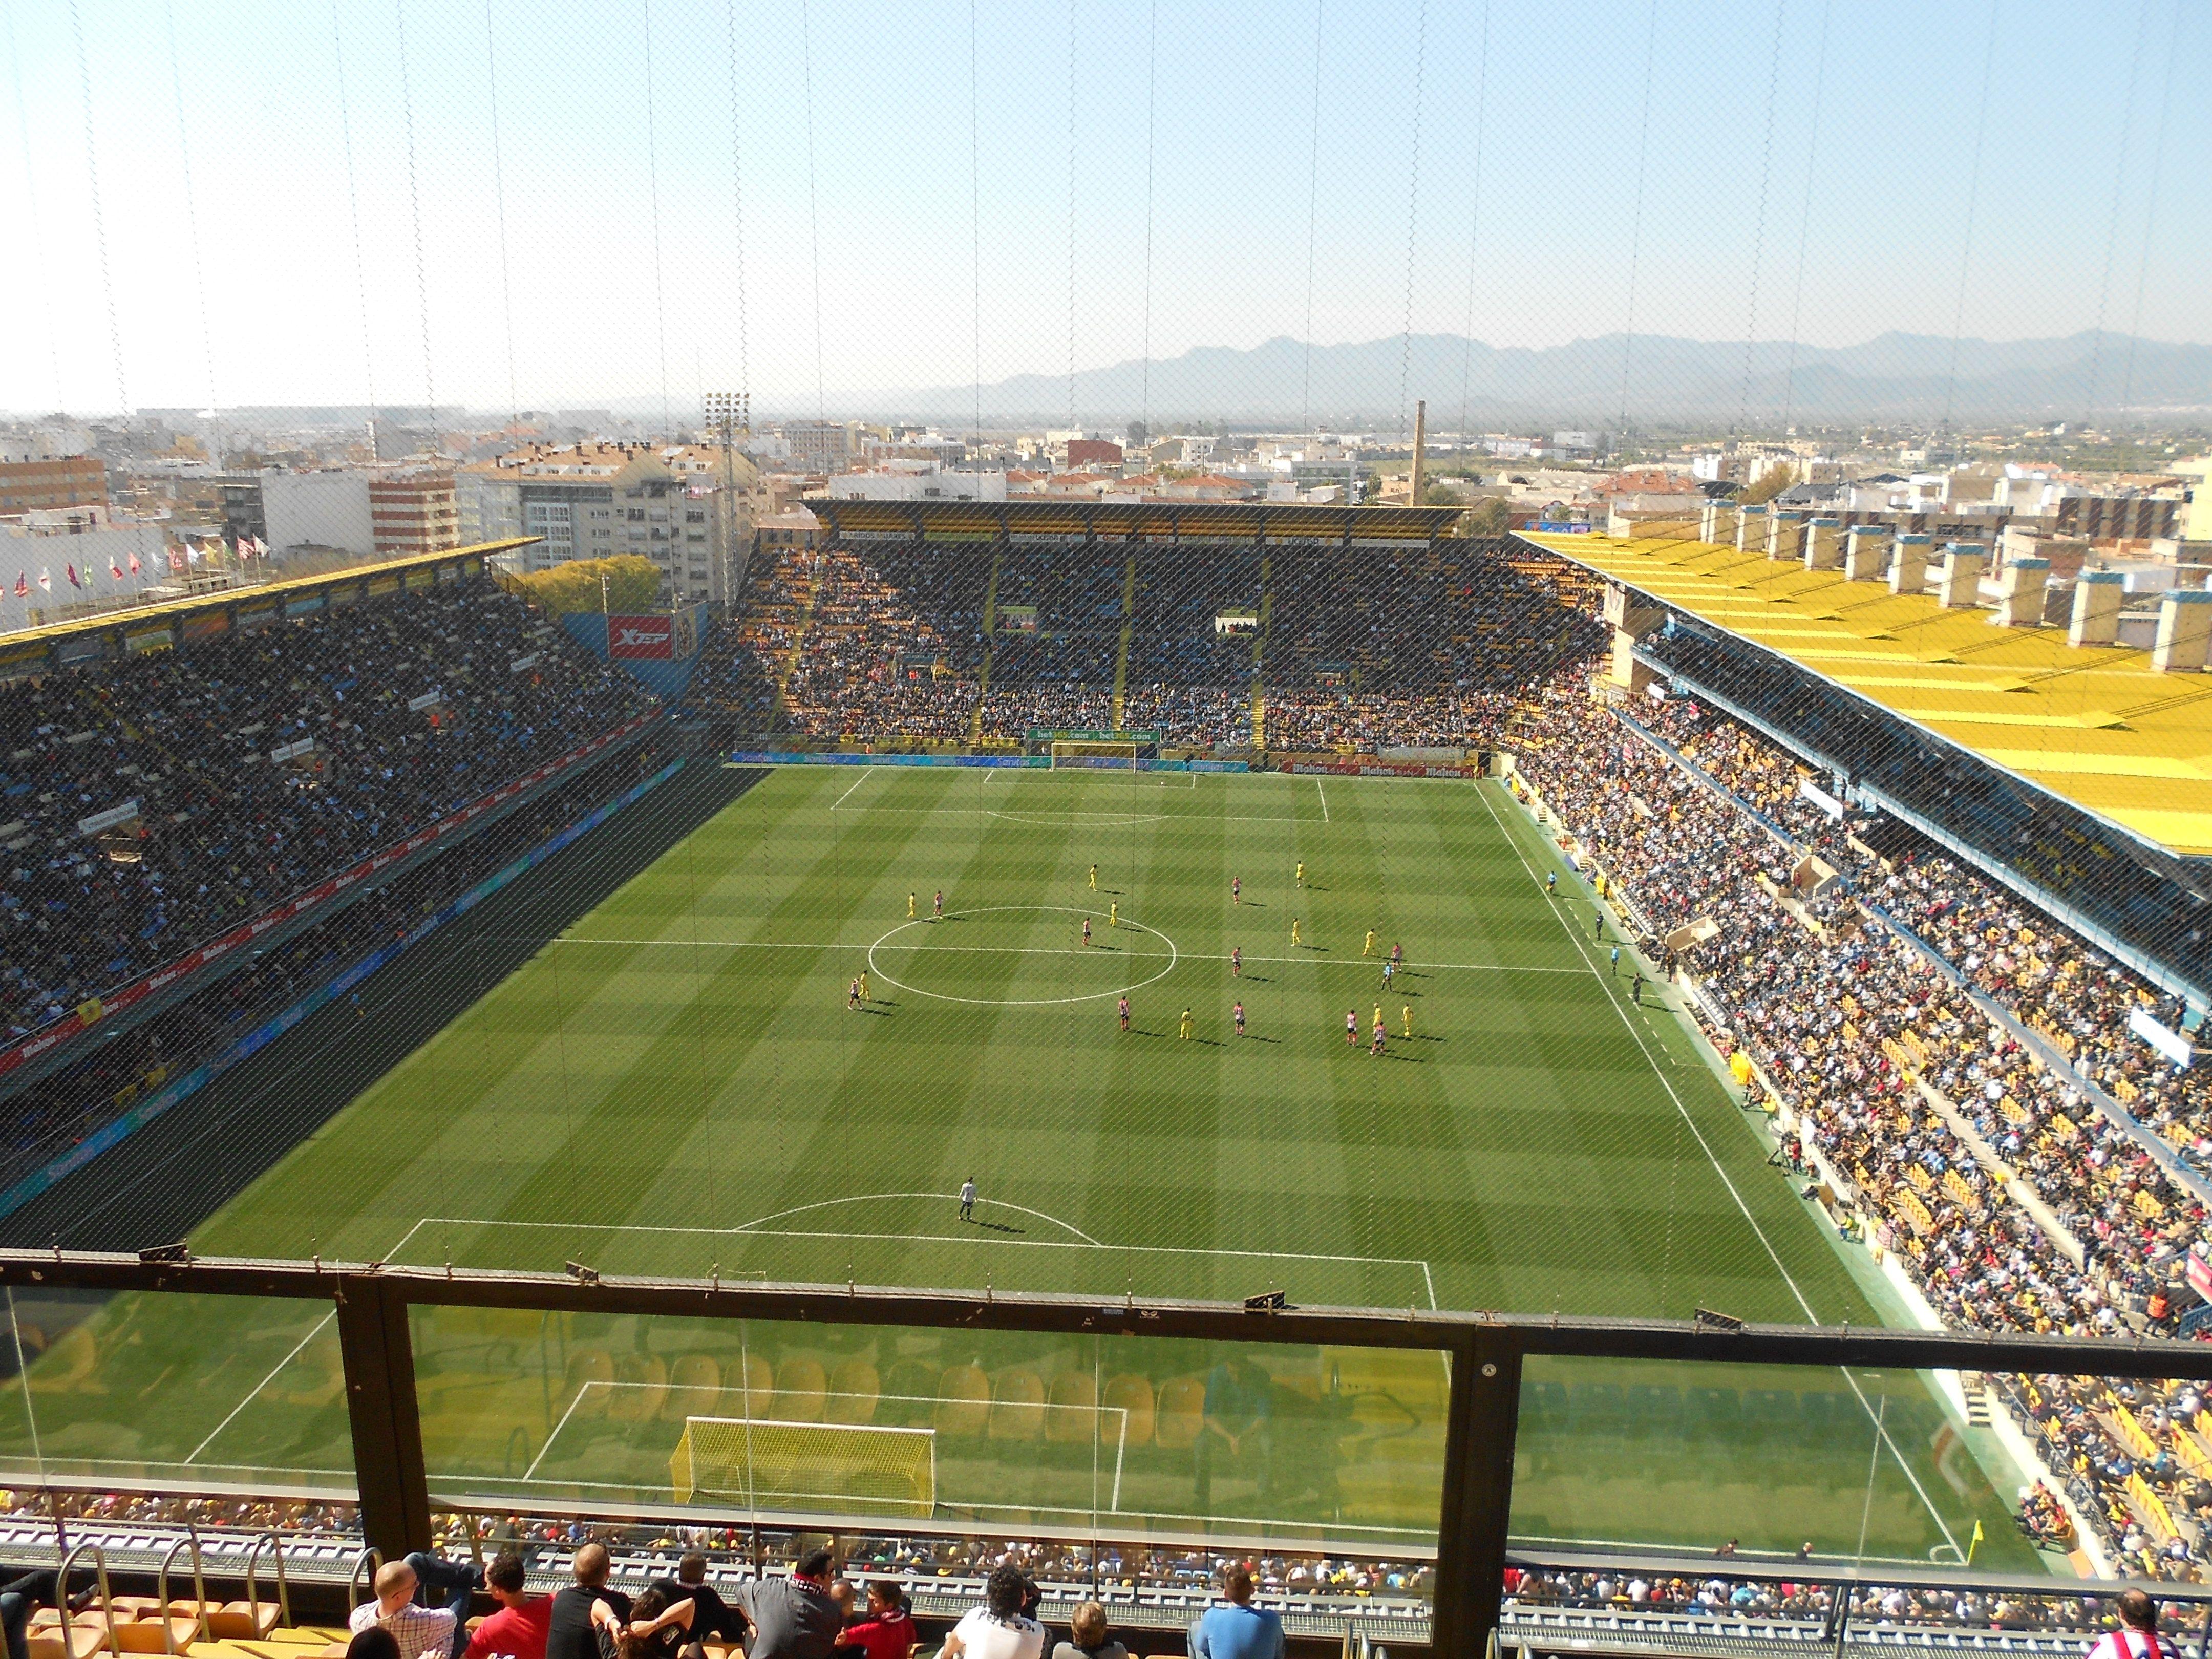 Villarreal C.F. - Athletic Bilbao from the away end. | Villarreal cf,  Soccer field, Bilbao